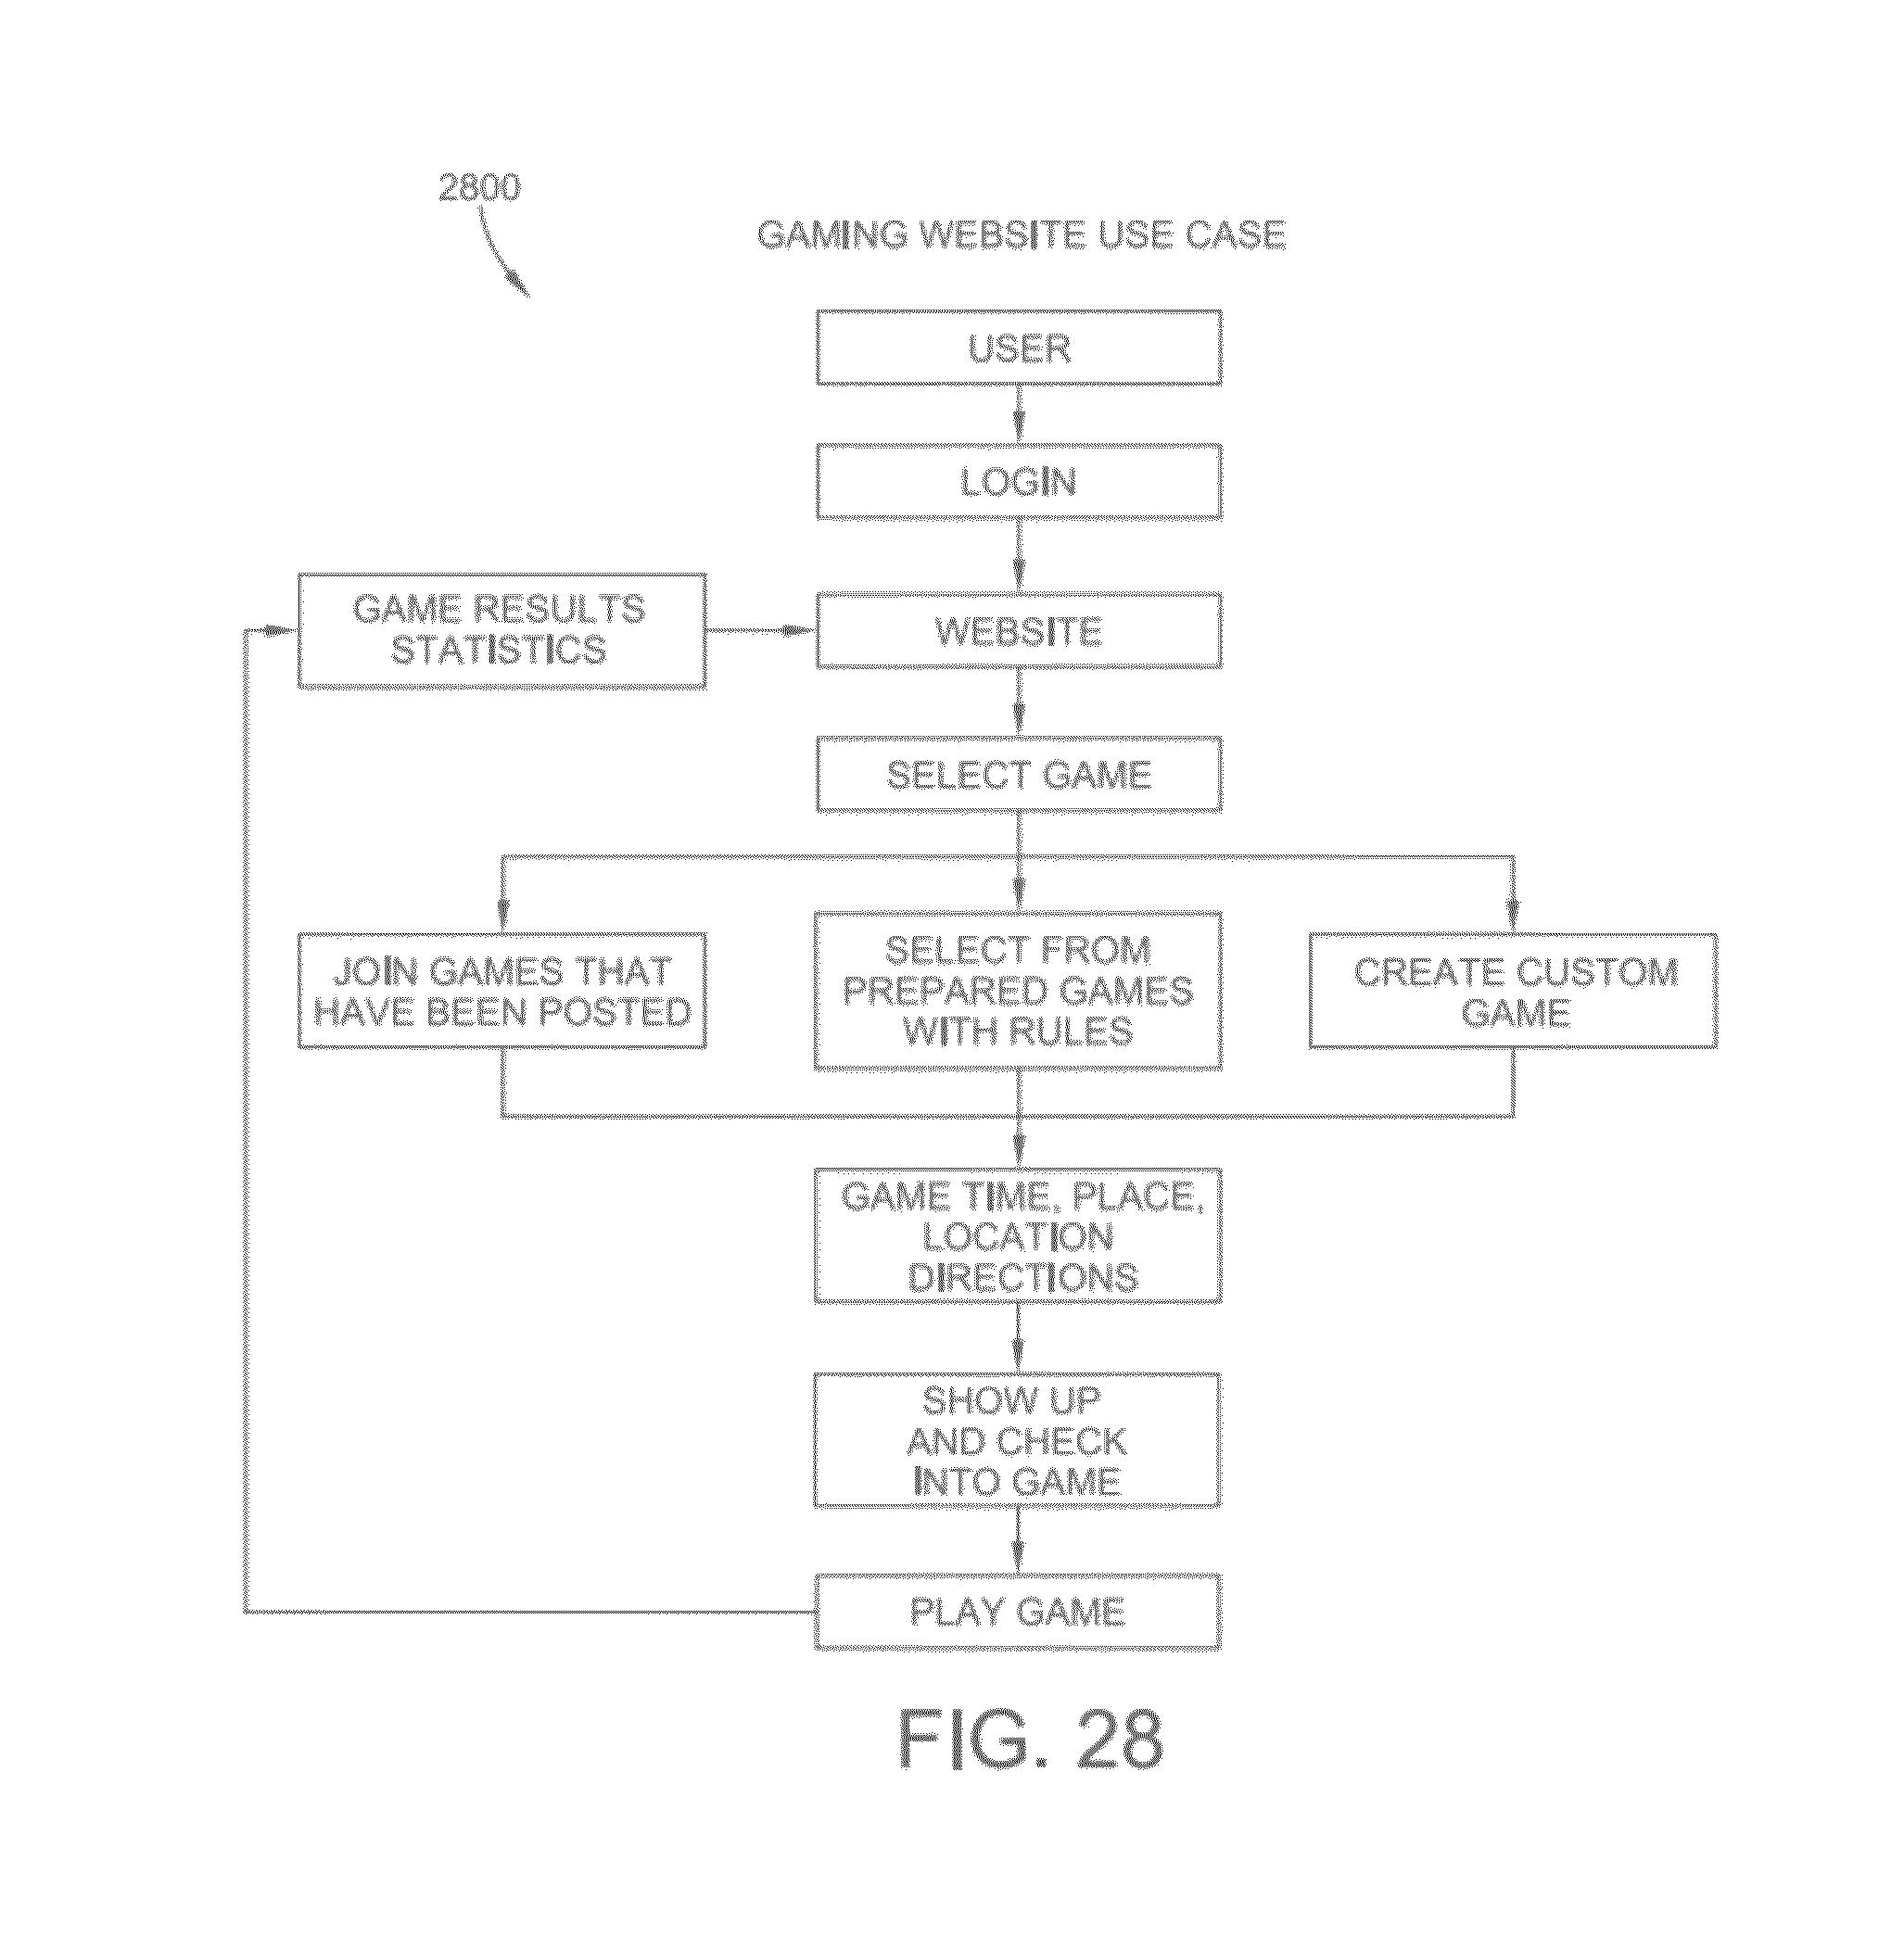 Patent US 9,285,589 B2